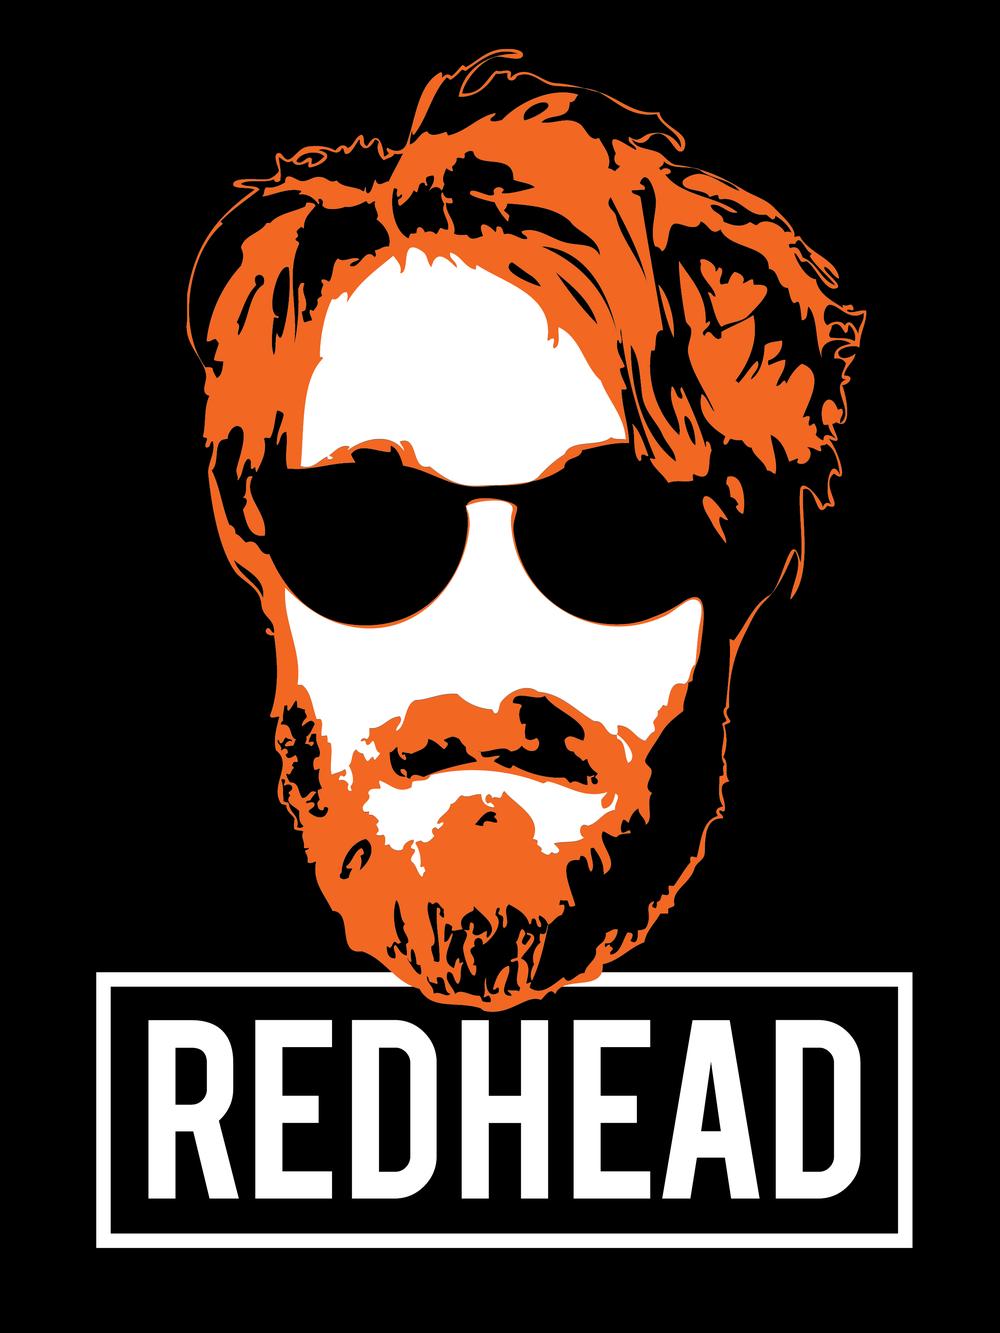 RedHead-01.png